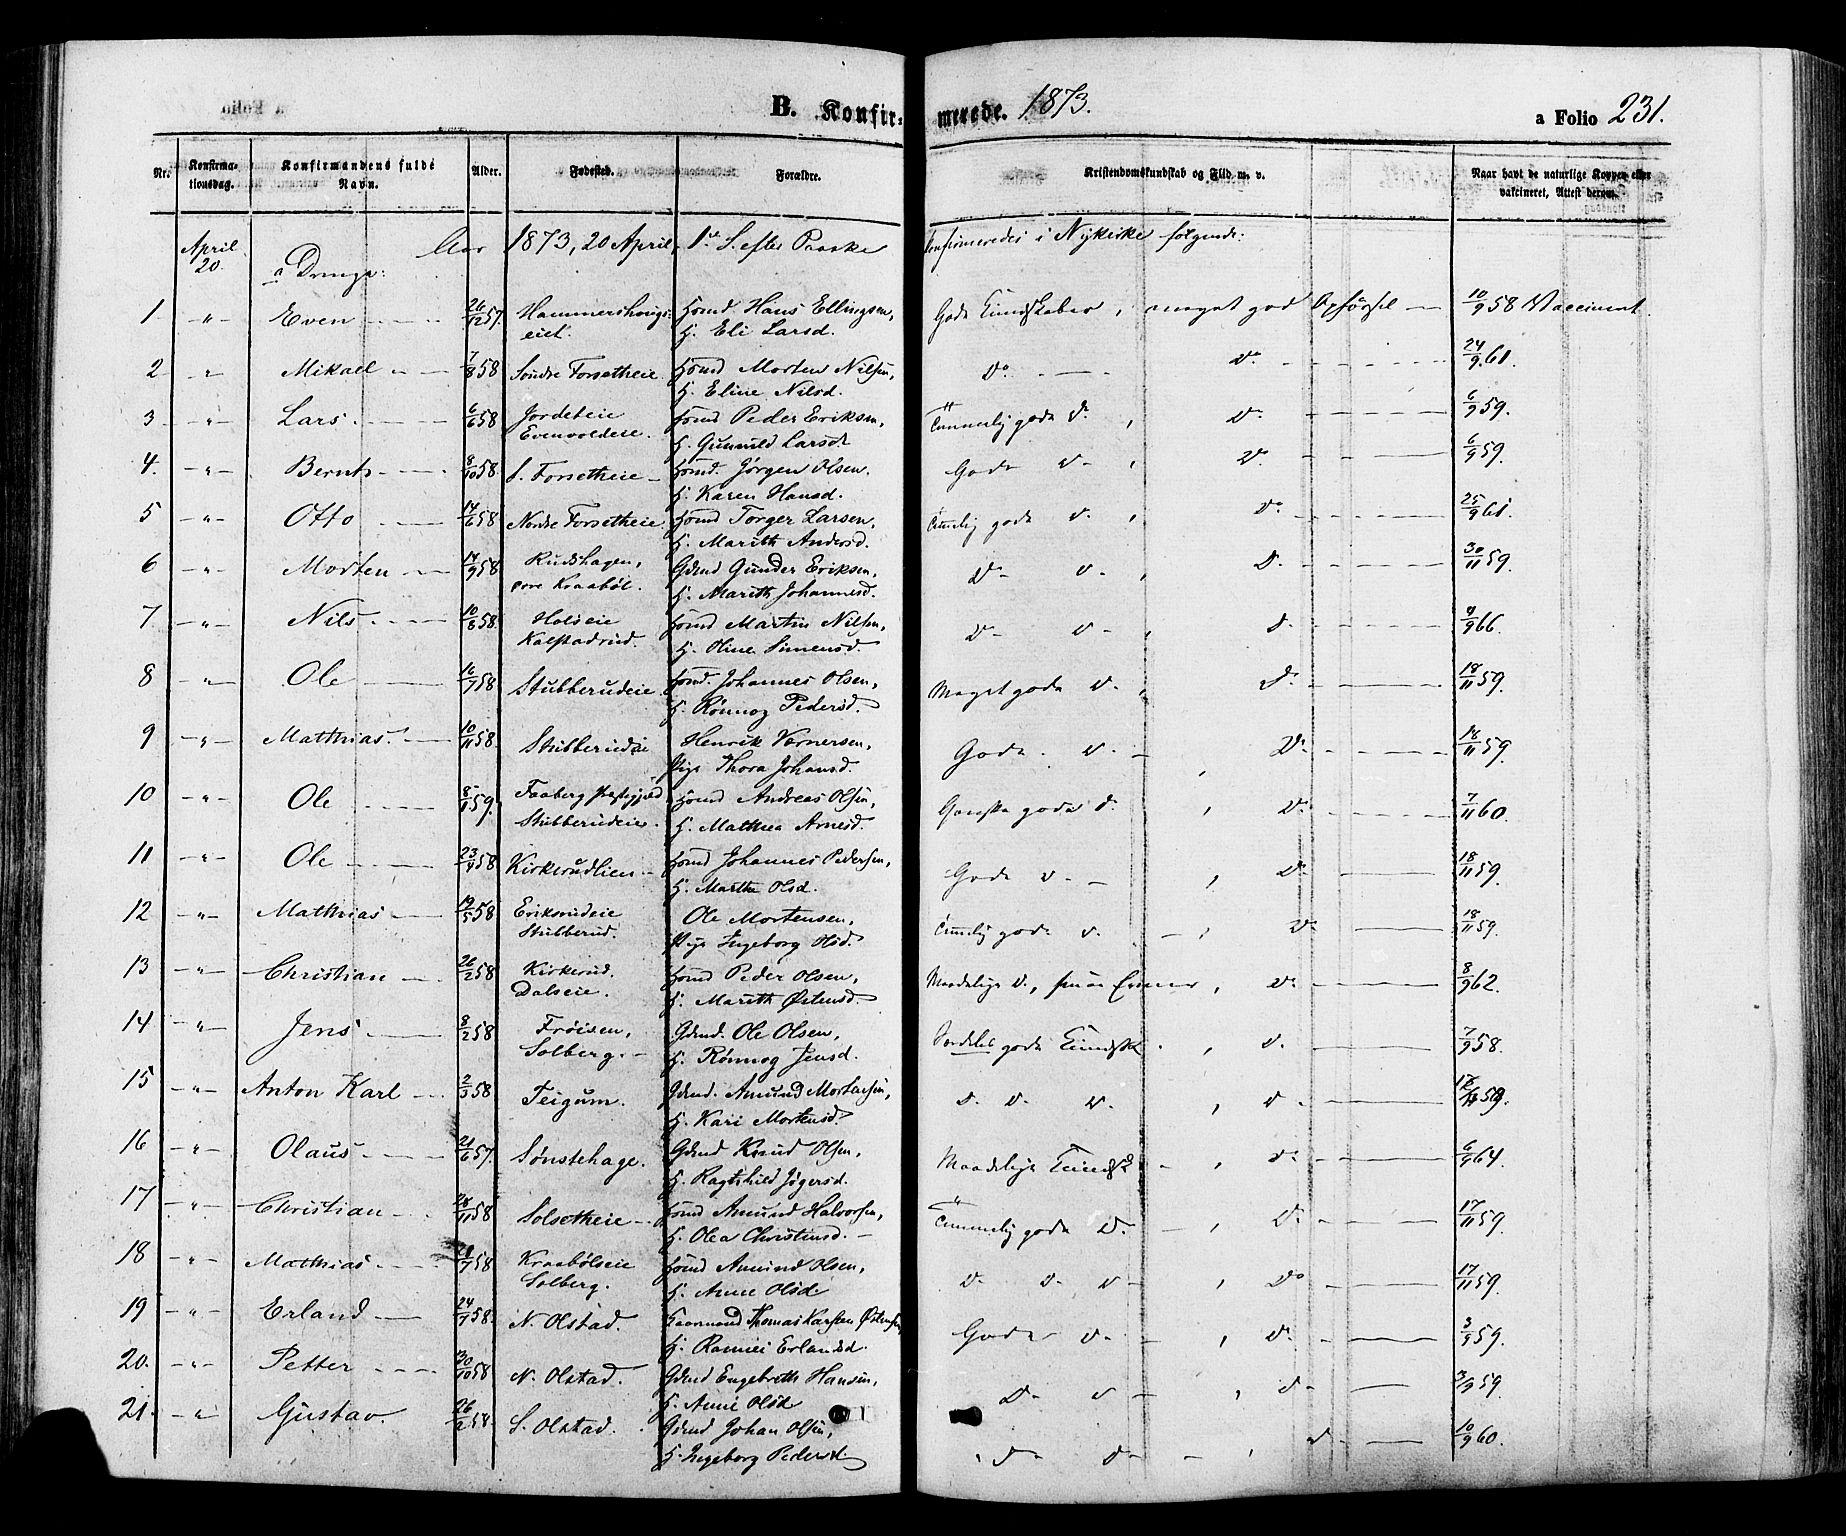 SAH, Gausdal prestekontor, Ministerialbok nr. 10, 1867-1886, s. 231